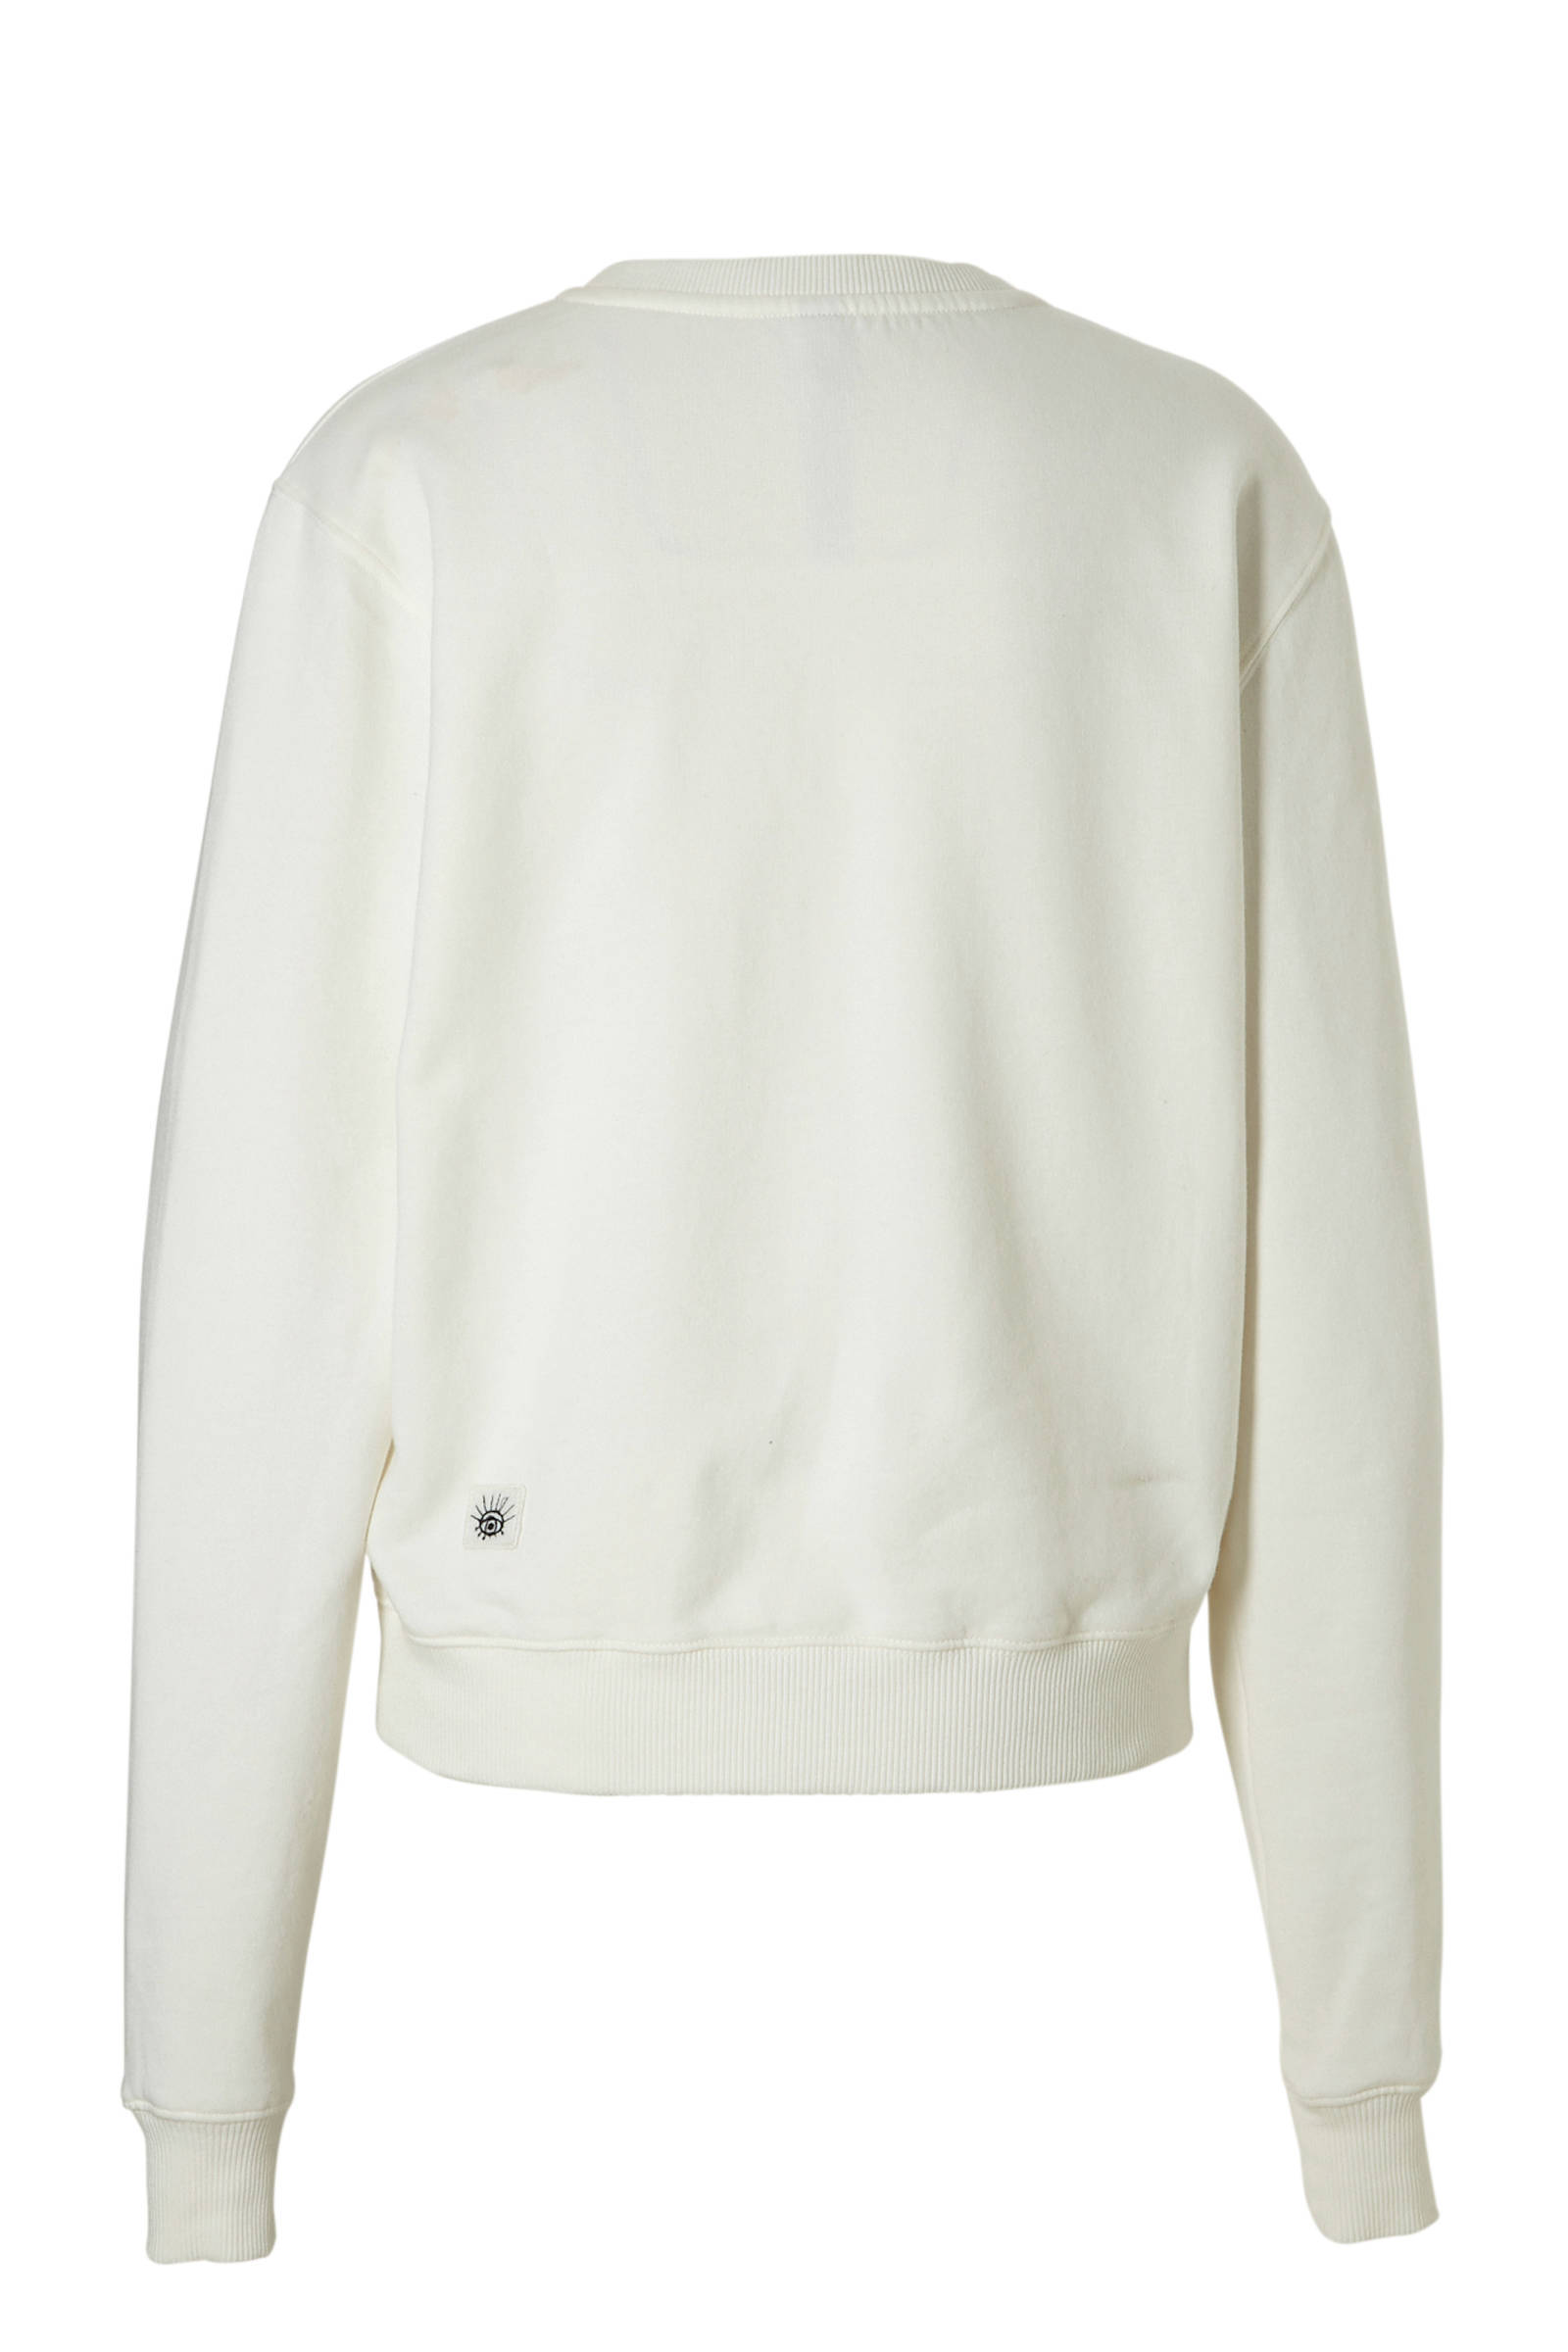 10DAYS sweater met borduursel